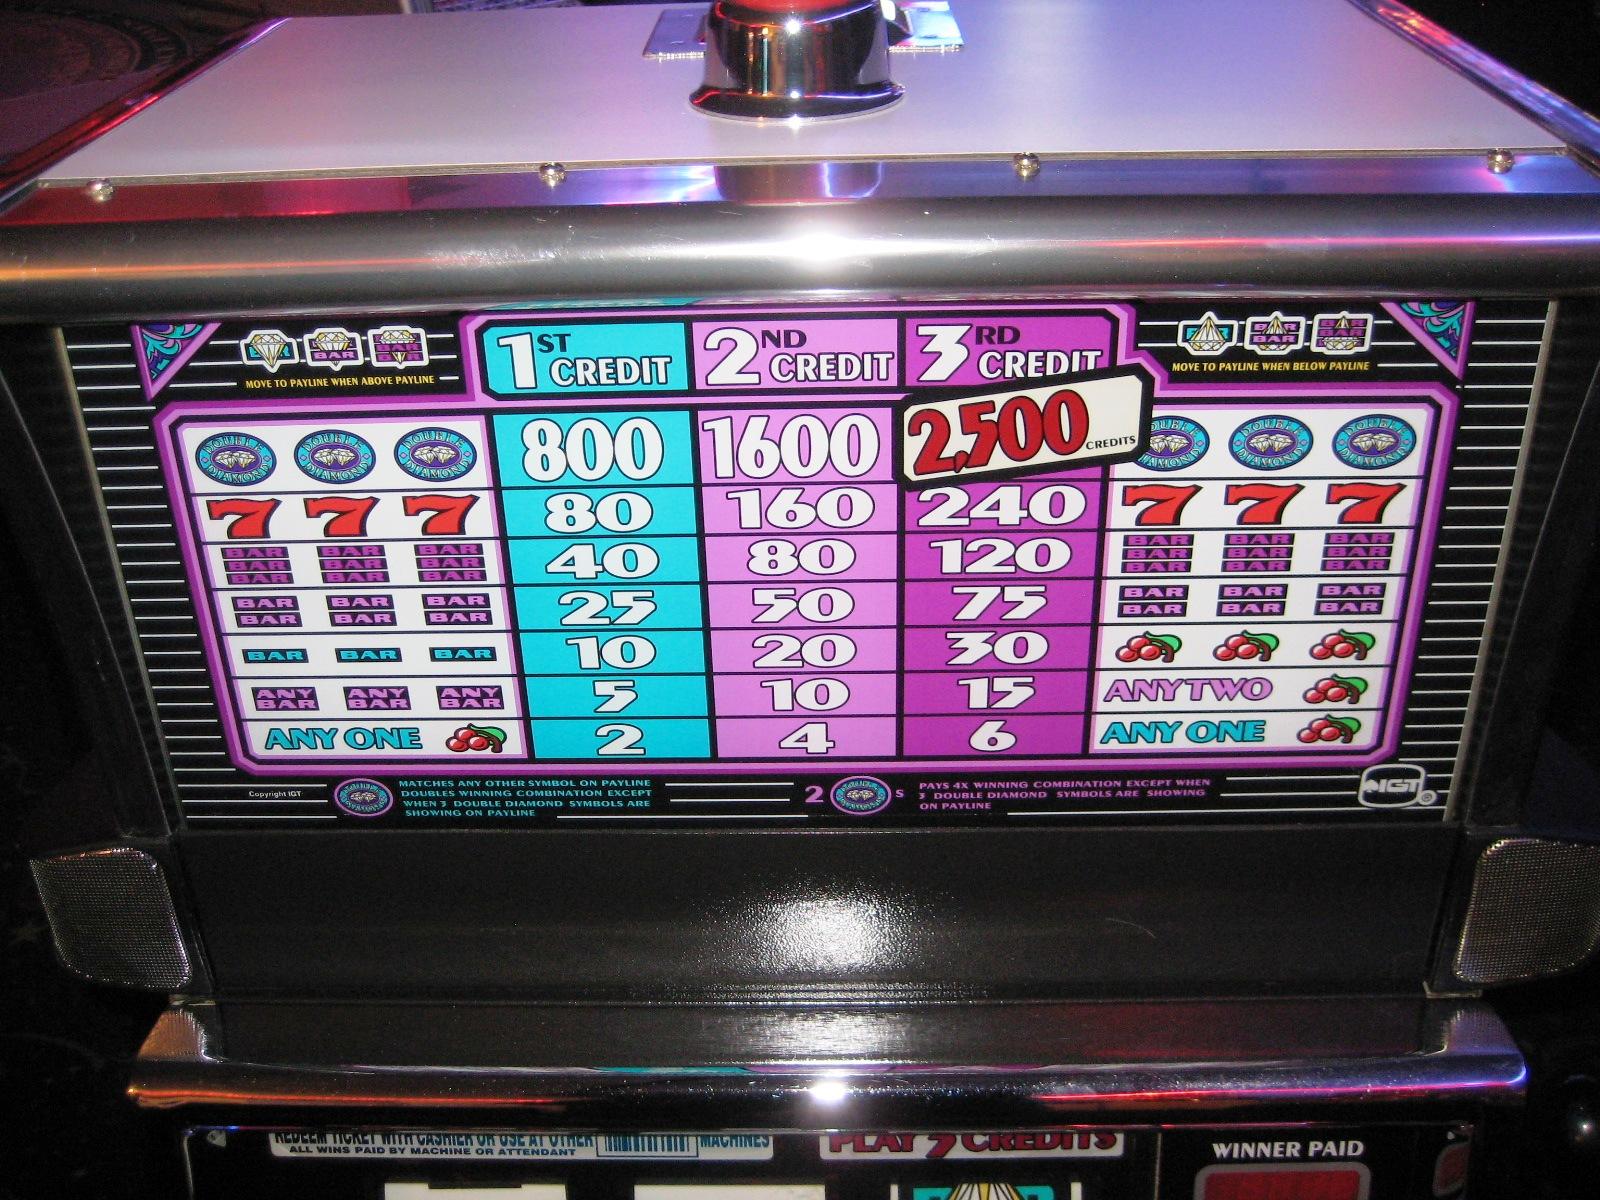 1990 double diamond slots for sale